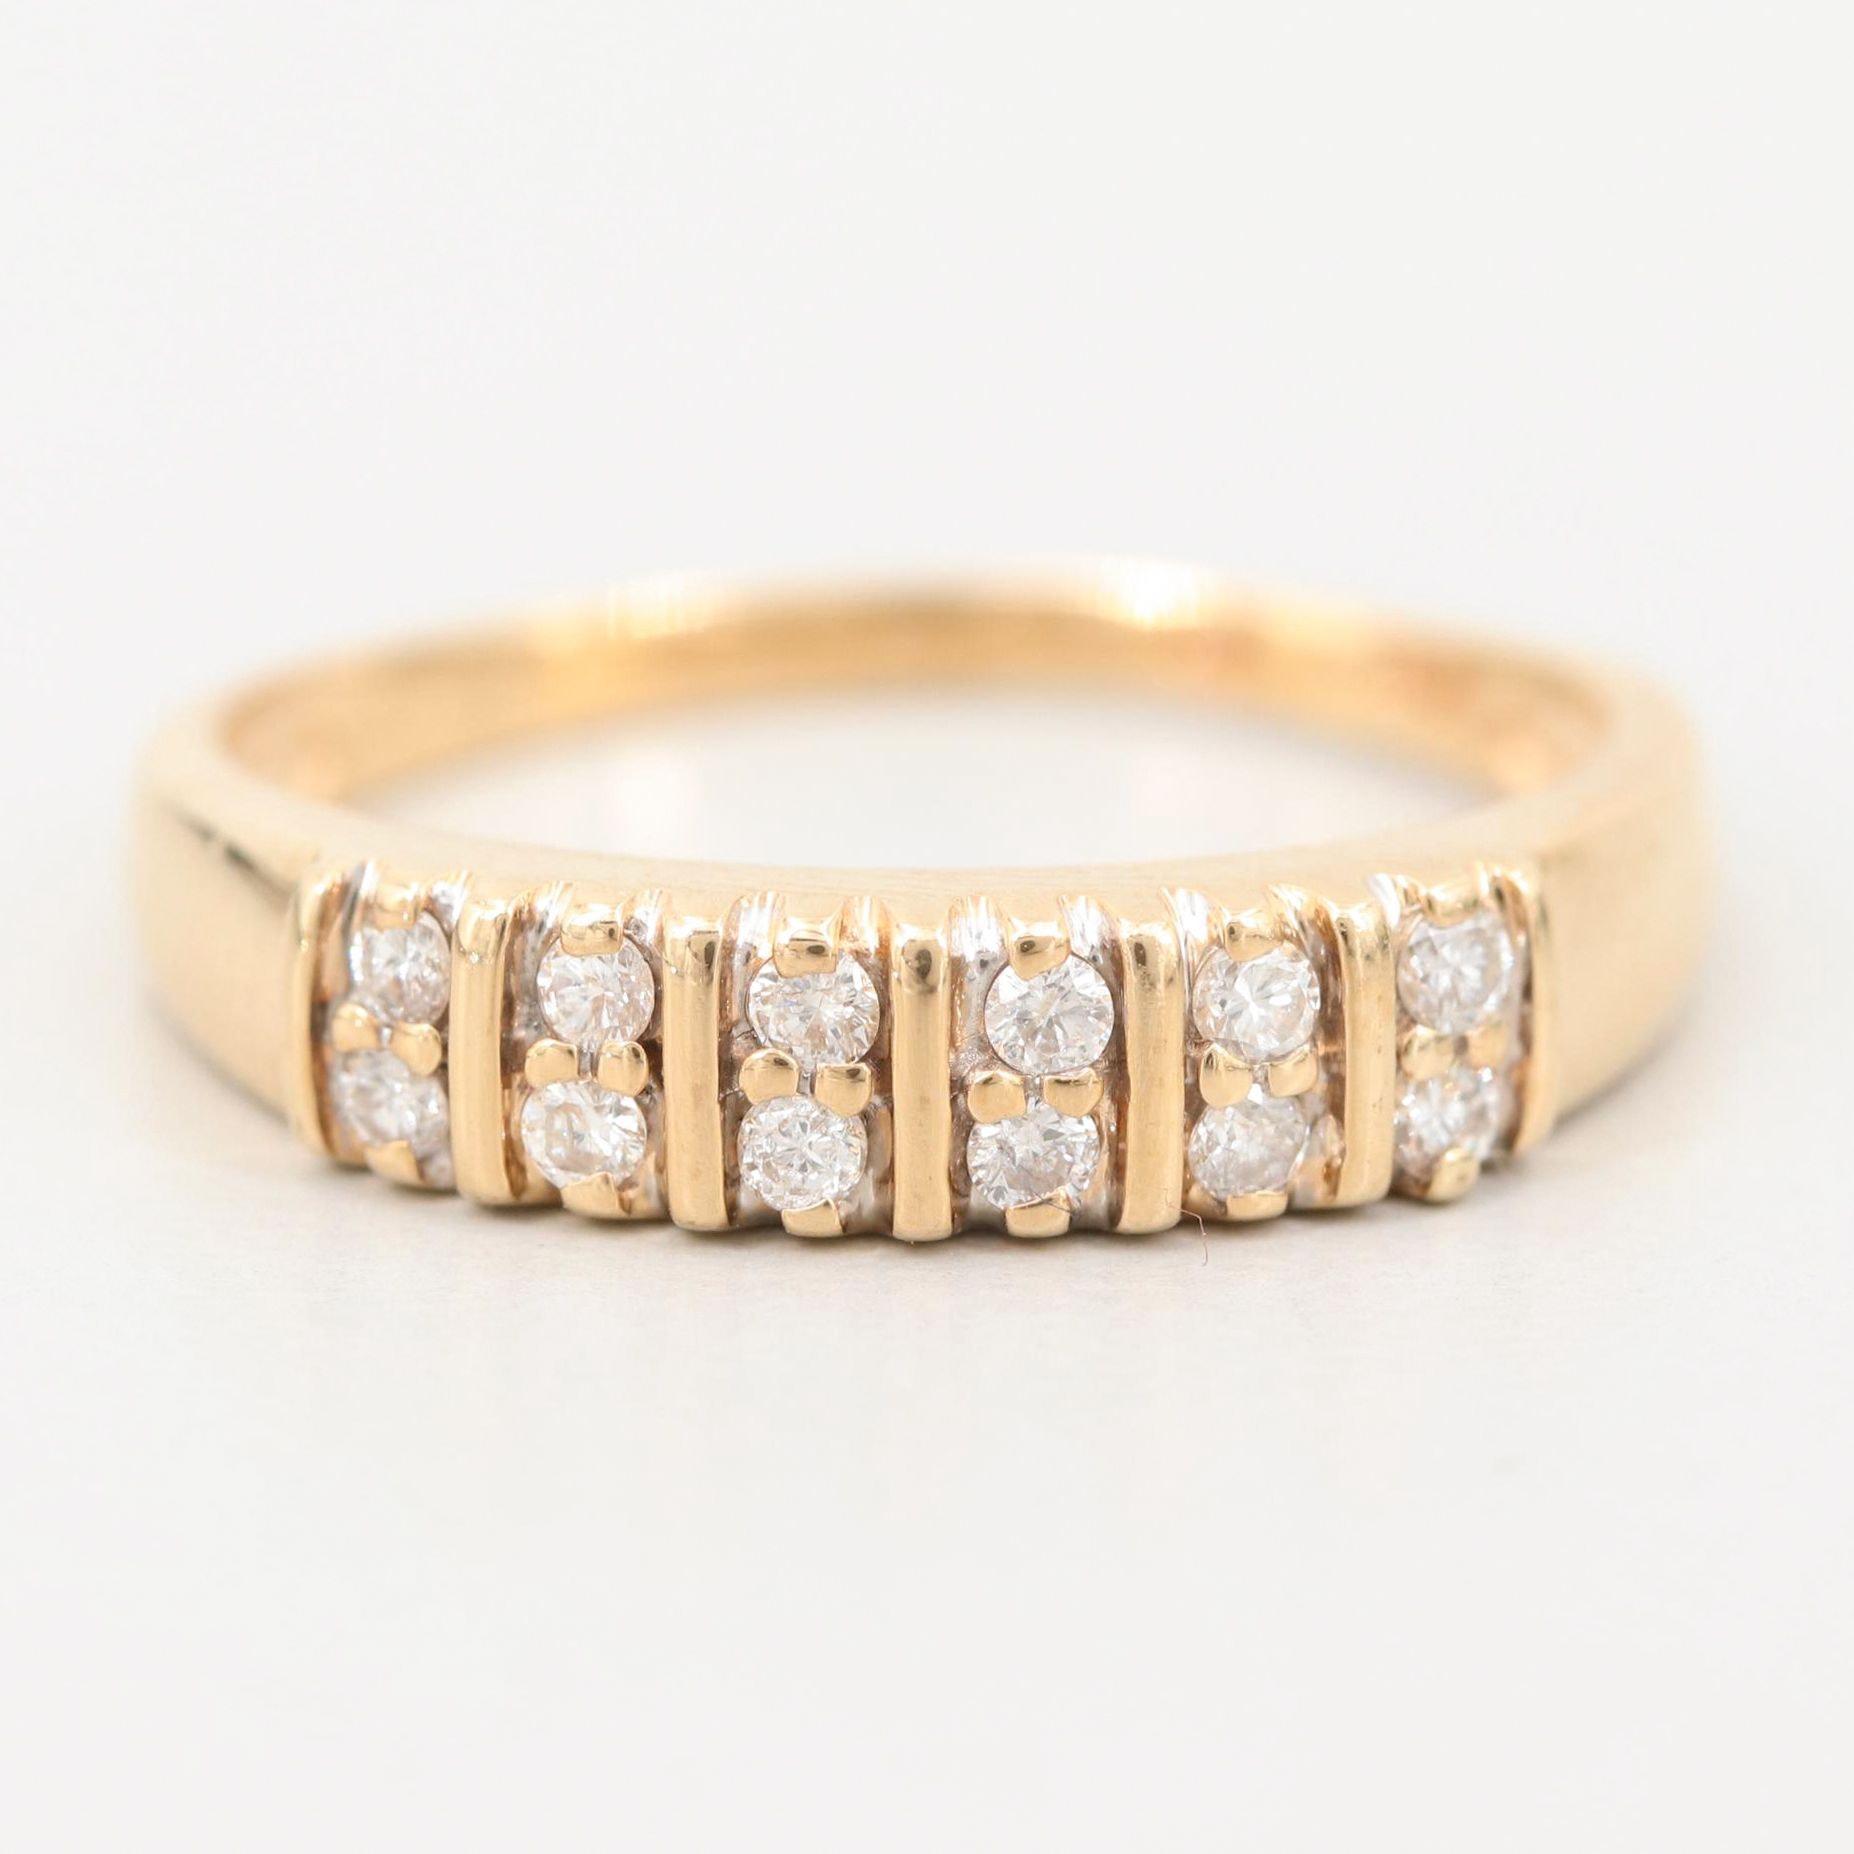 14K Yellow Gold Diamond Ring